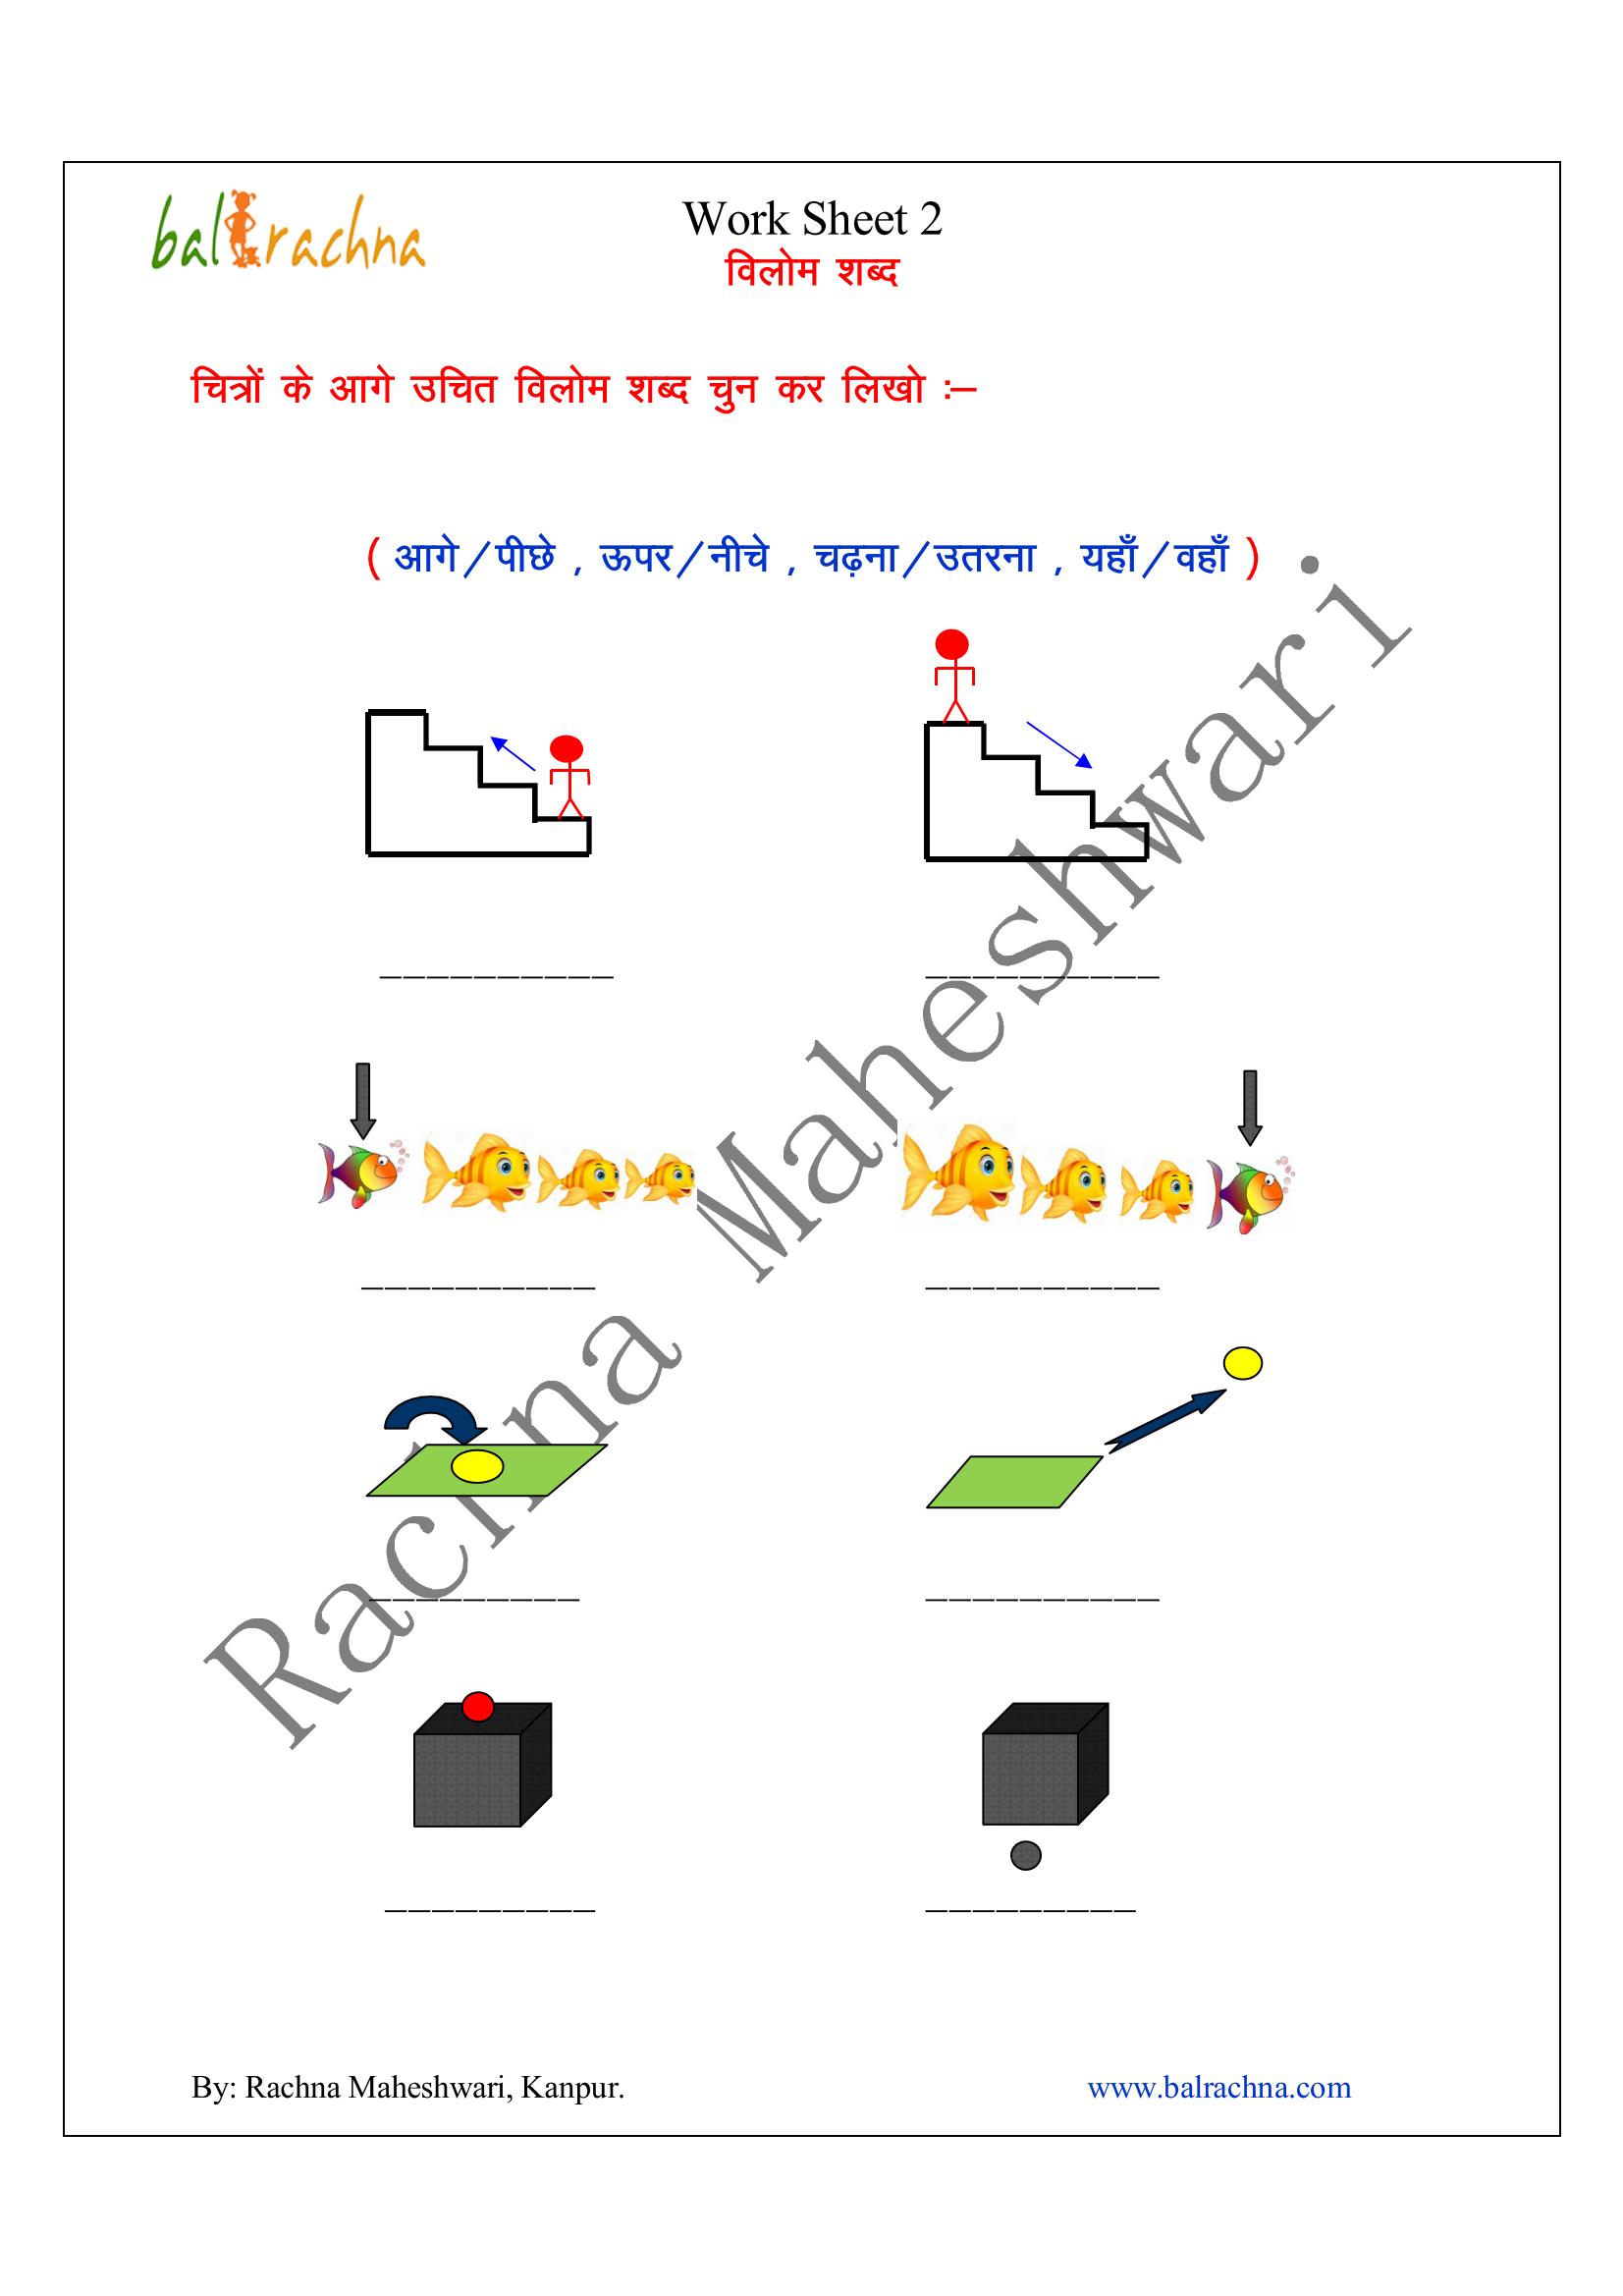 Pin By Aarthy Ramachandran On Hindi